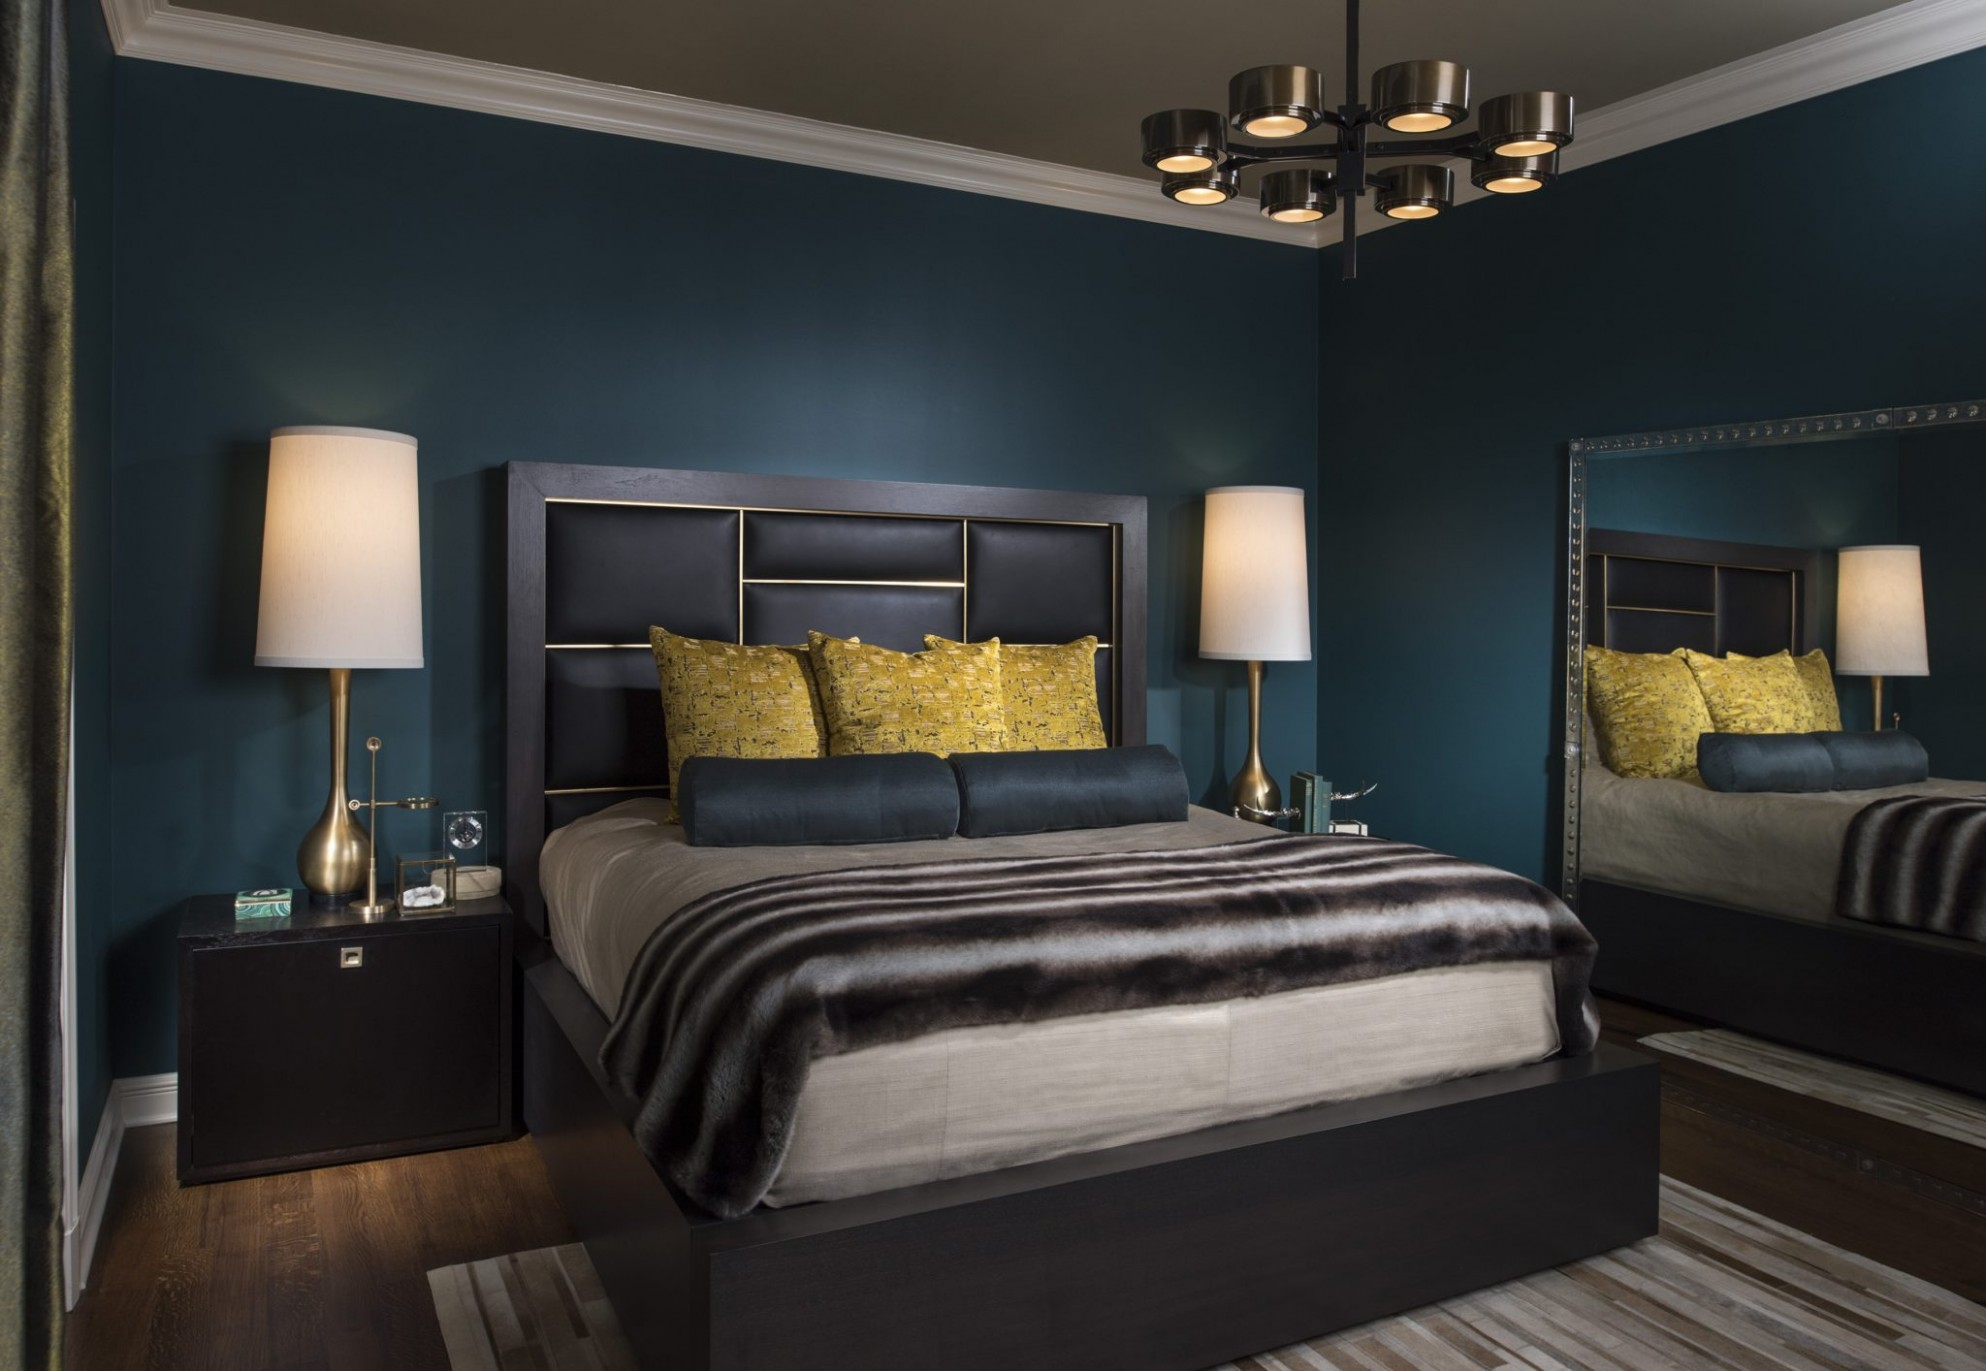 Richly Colored Dark Bedroom Designs - Chairish Blog - Bedroom Ideas Dark